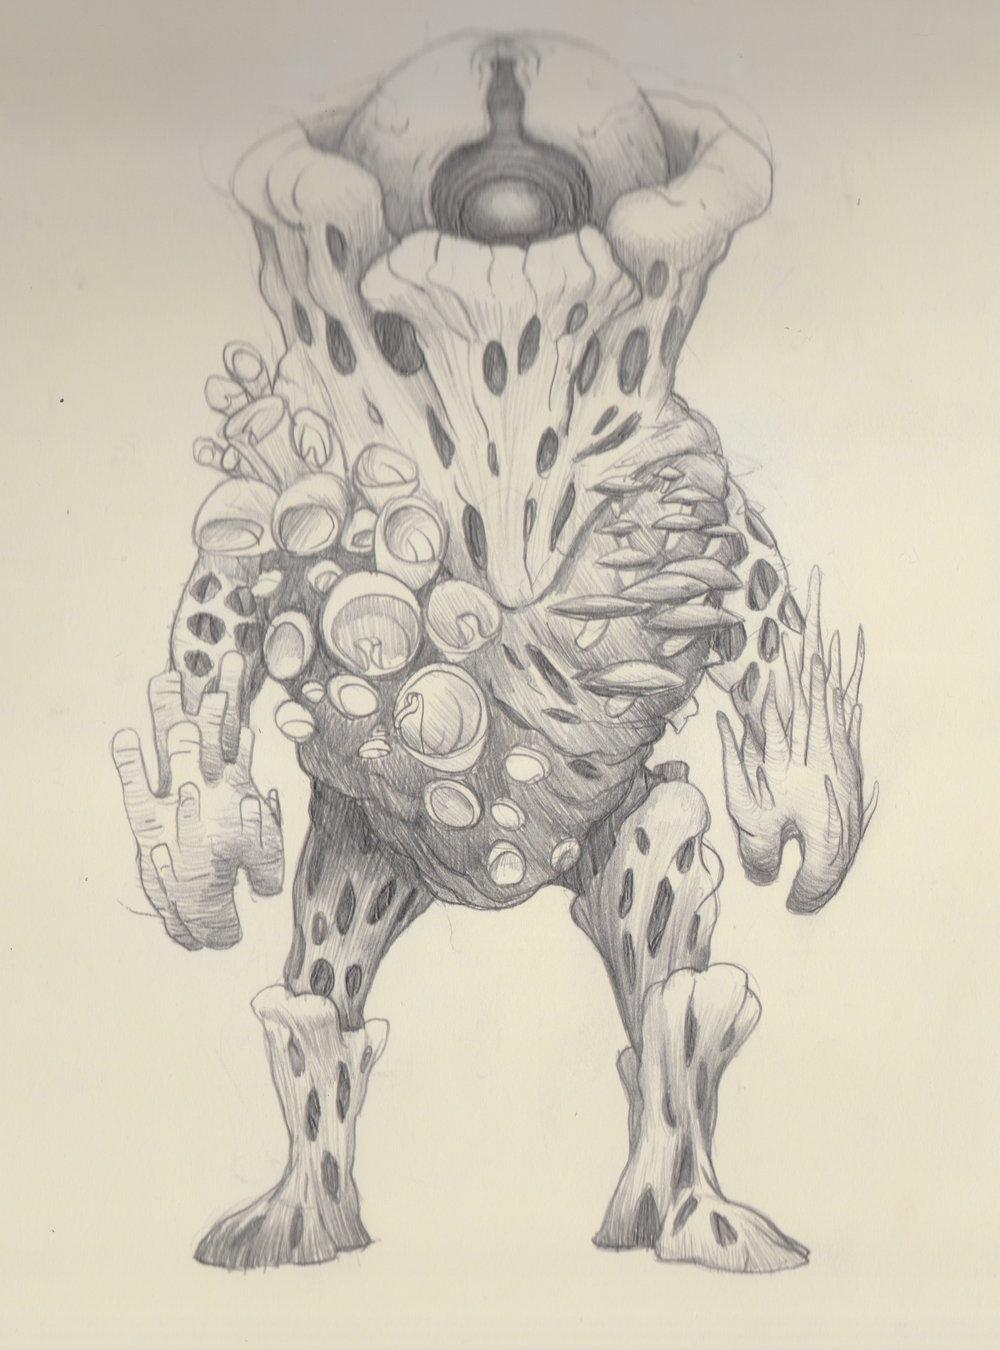 Odds-fungal-suit.jpeg